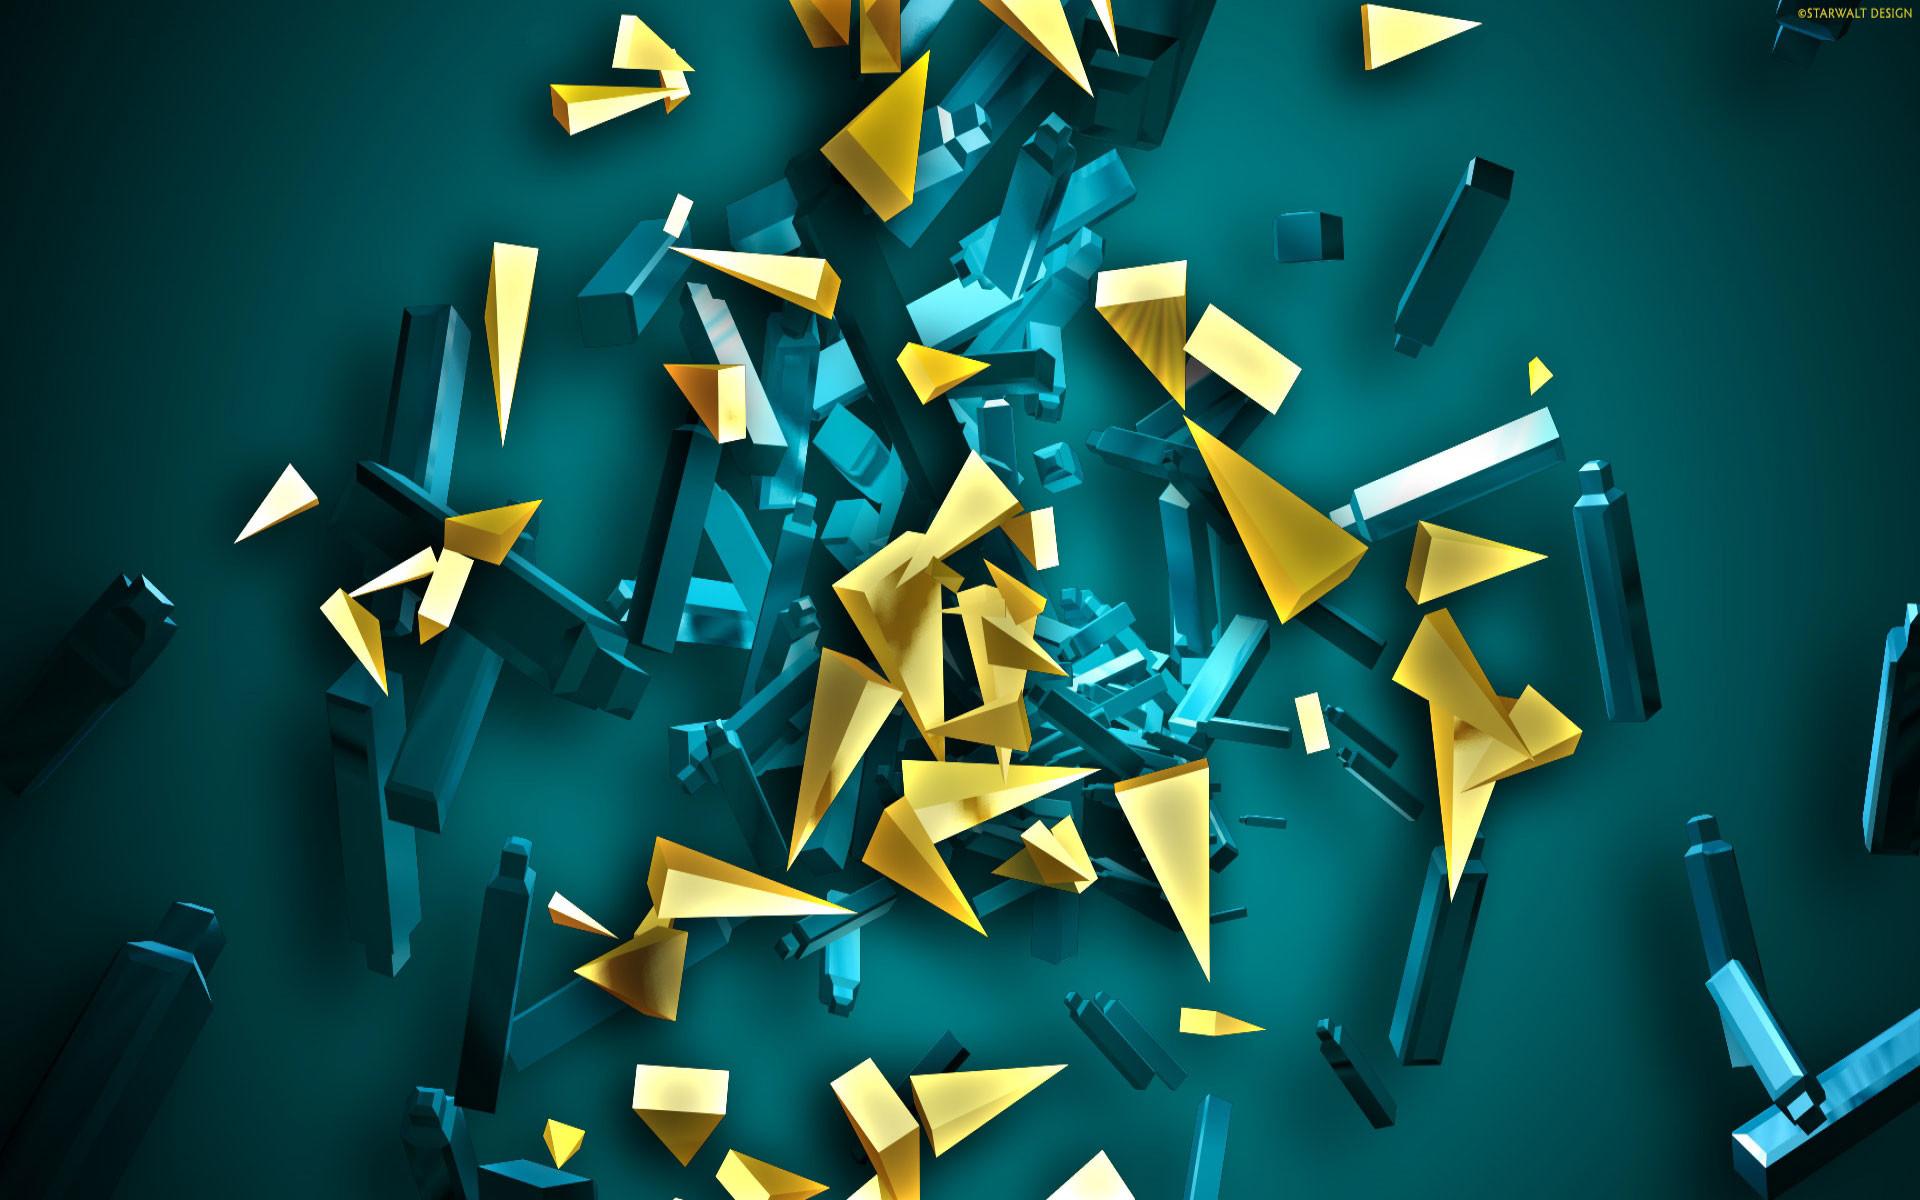 cool 3d abstract wallpaper